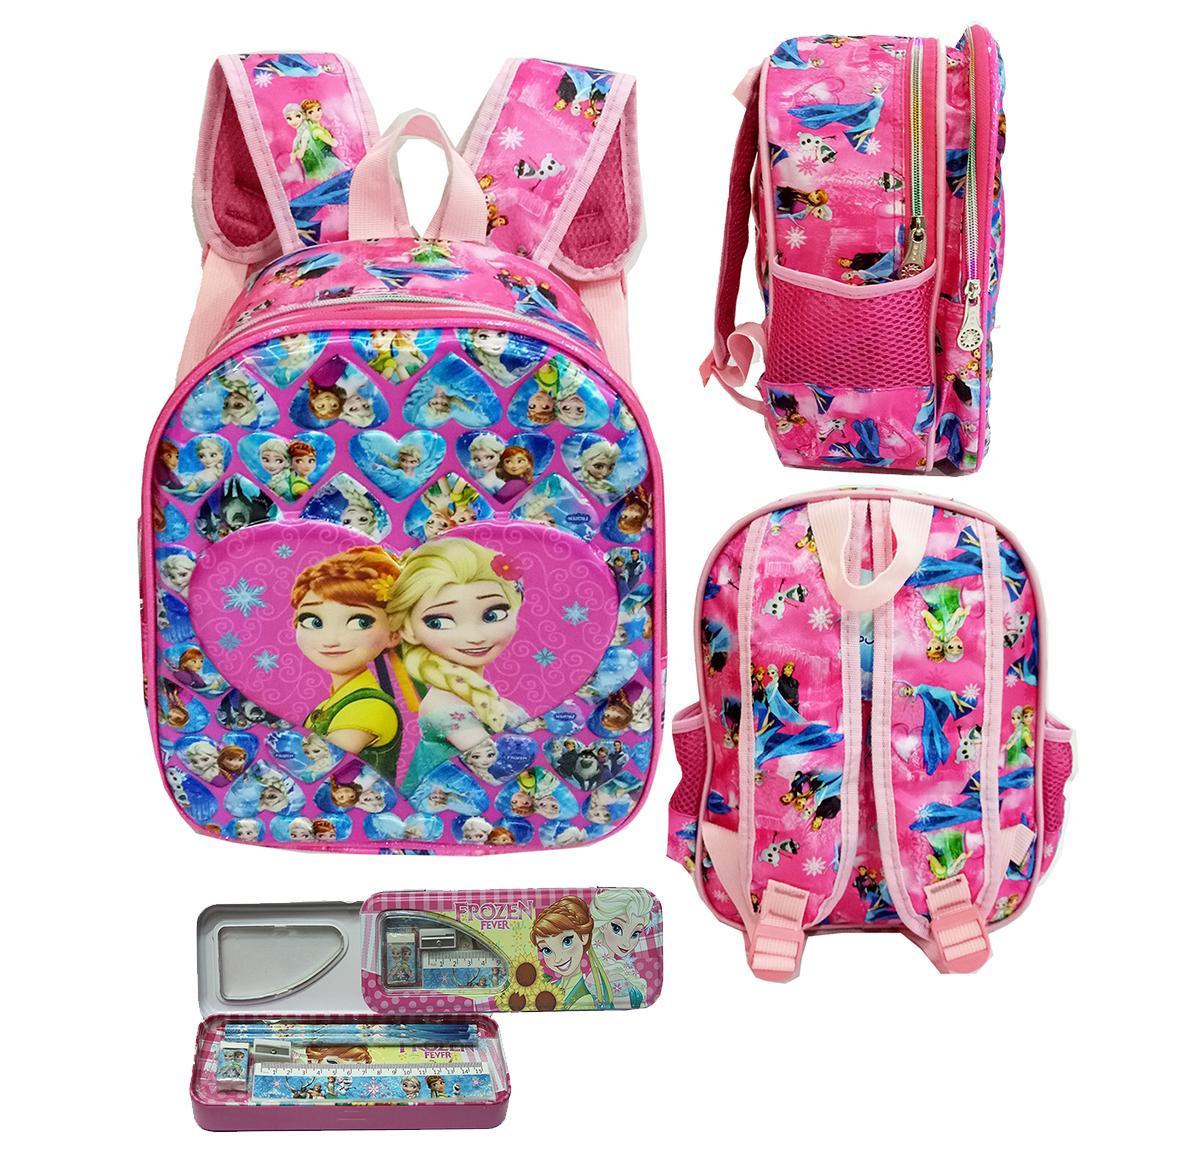 Onlan Tas Ransel Anak Sekolah TK 2 Kantung Import Karakter Anak Perempuan + Kotak Pensil